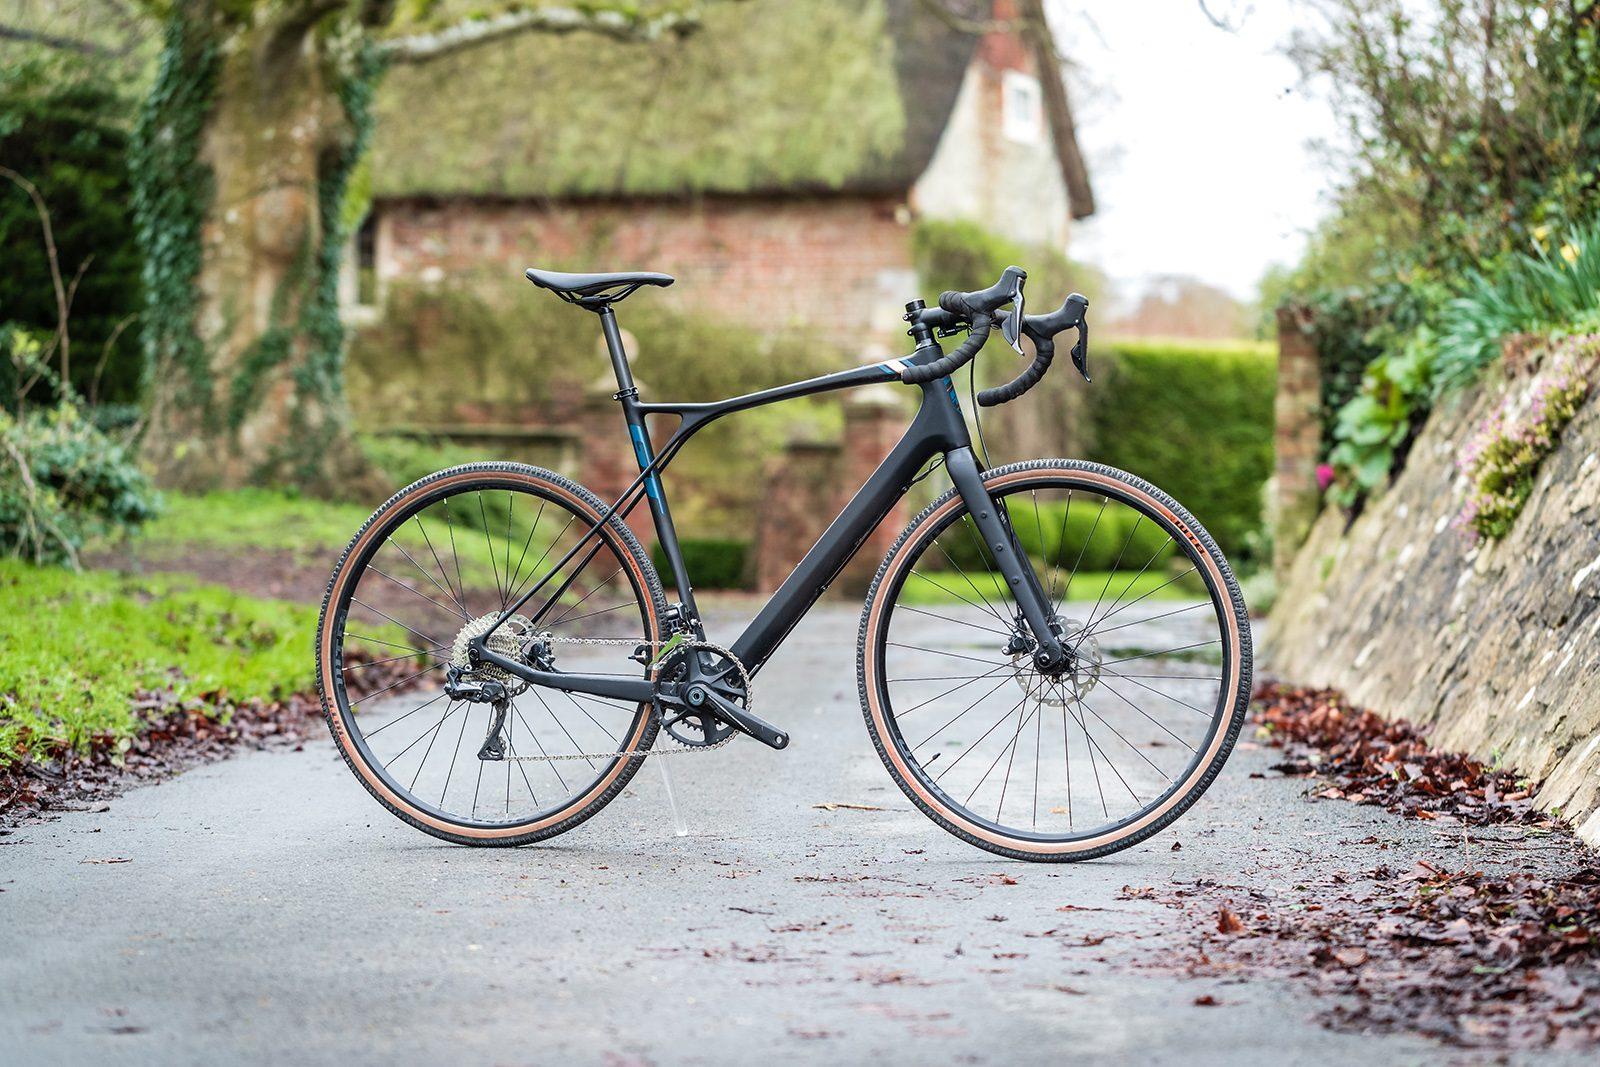 Alloy 700c Bicycle Bike Kickstand for Flat Mount Disc Brake